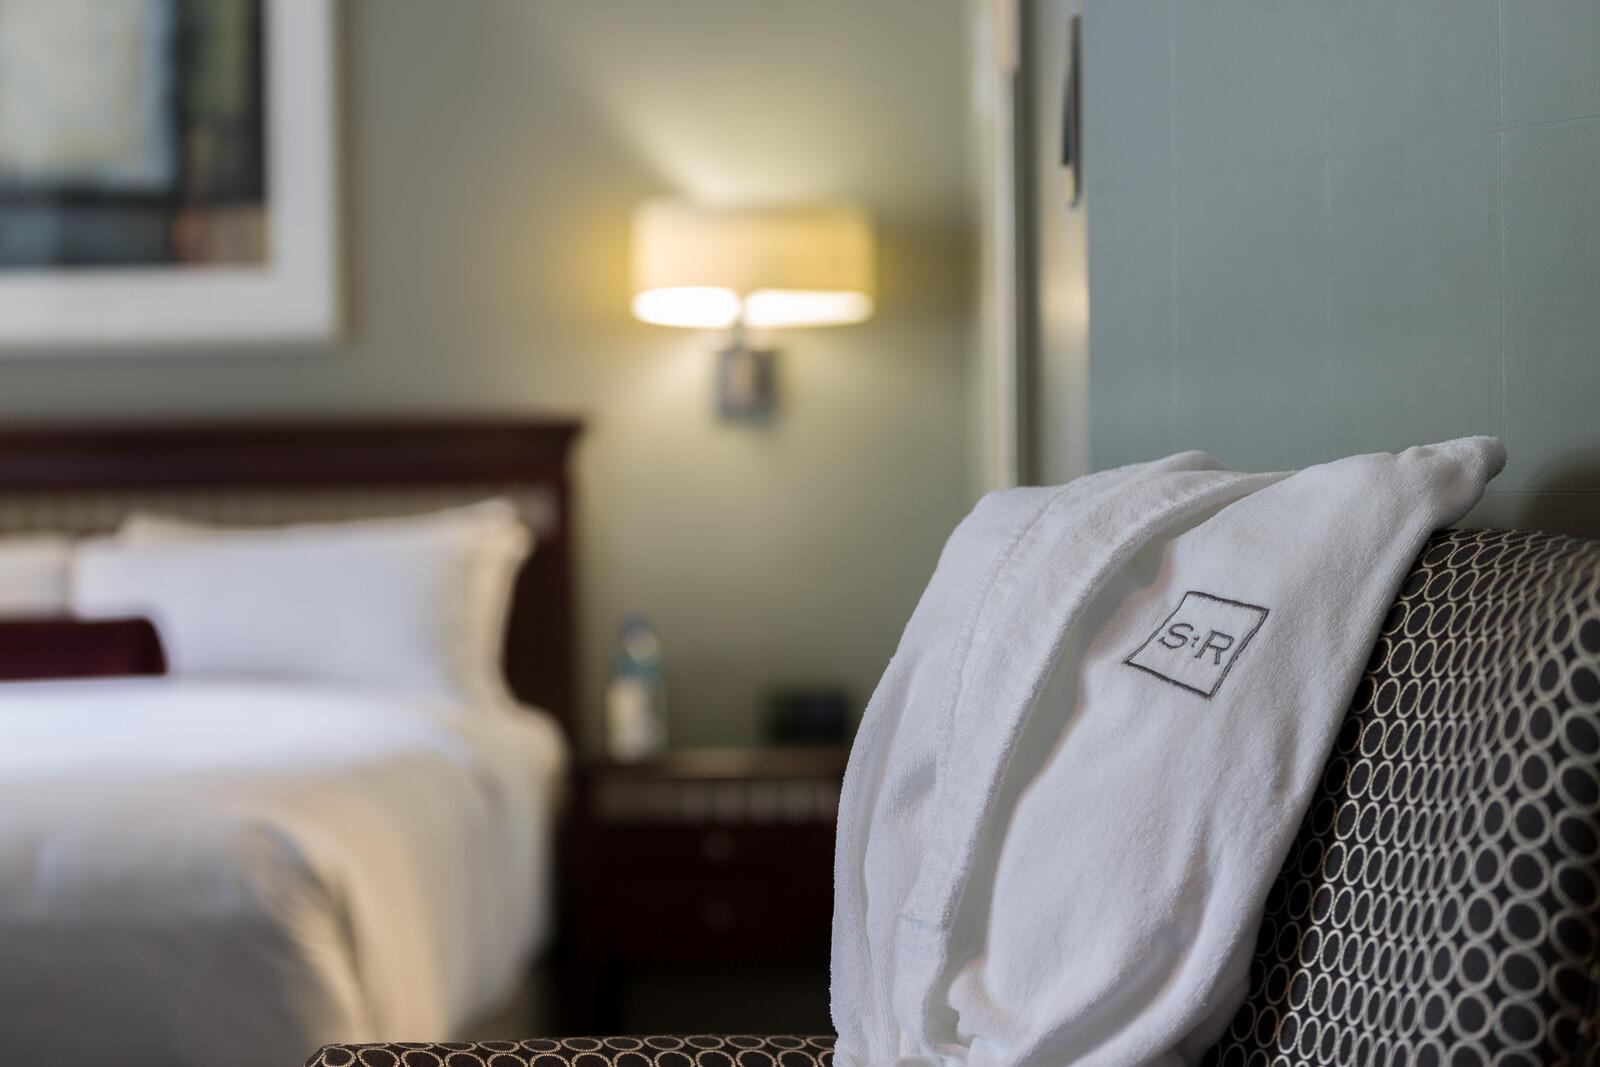 Close photo of branded St. Regis bathrobe.